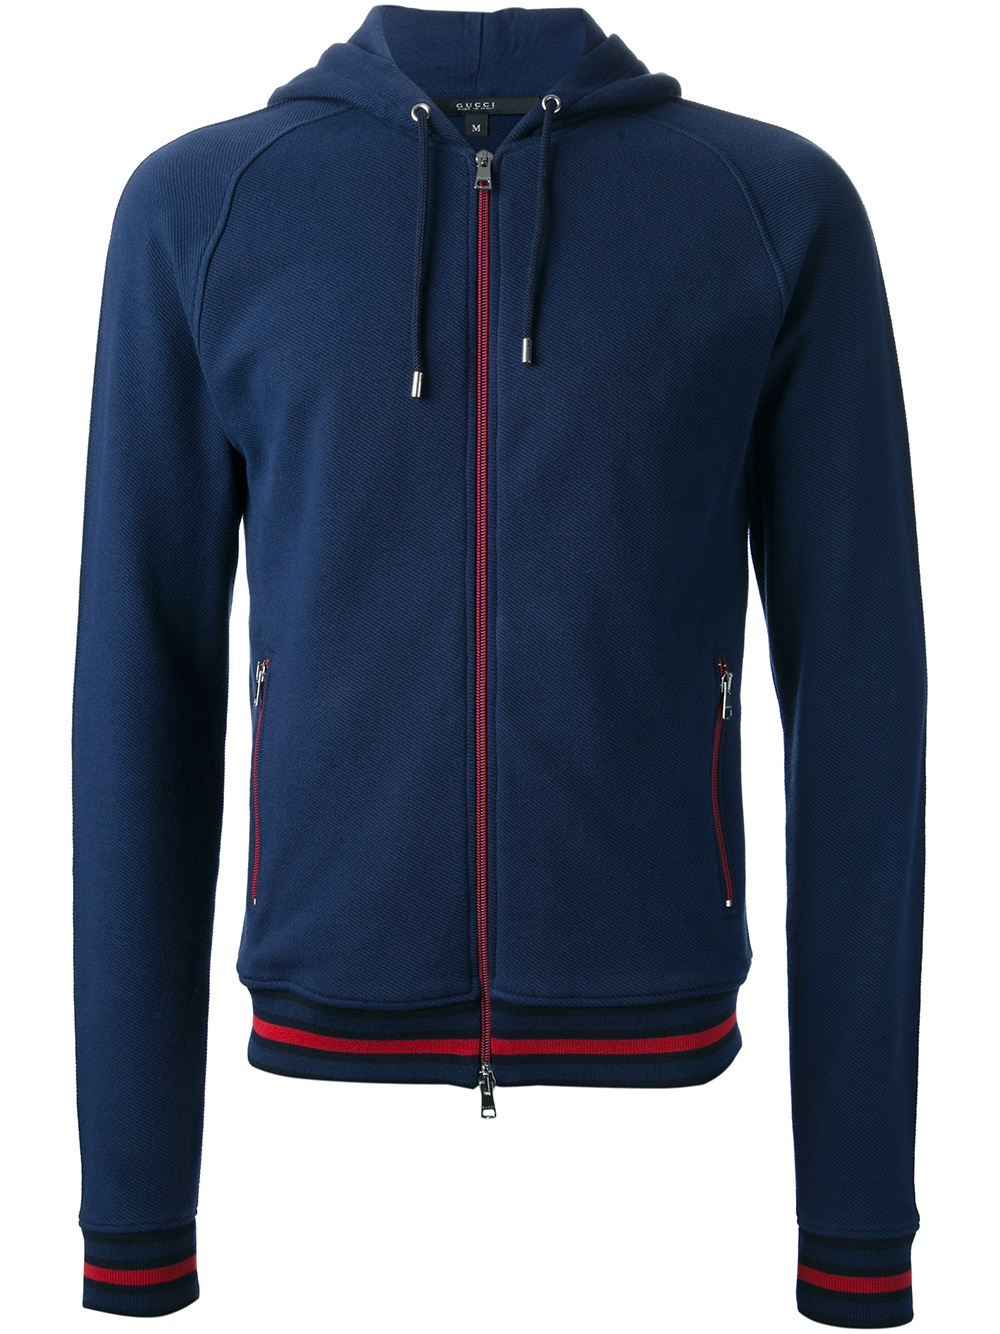 gucci zip hoodie in blue for men lyst. Black Bedroom Furniture Sets. Home Design Ideas